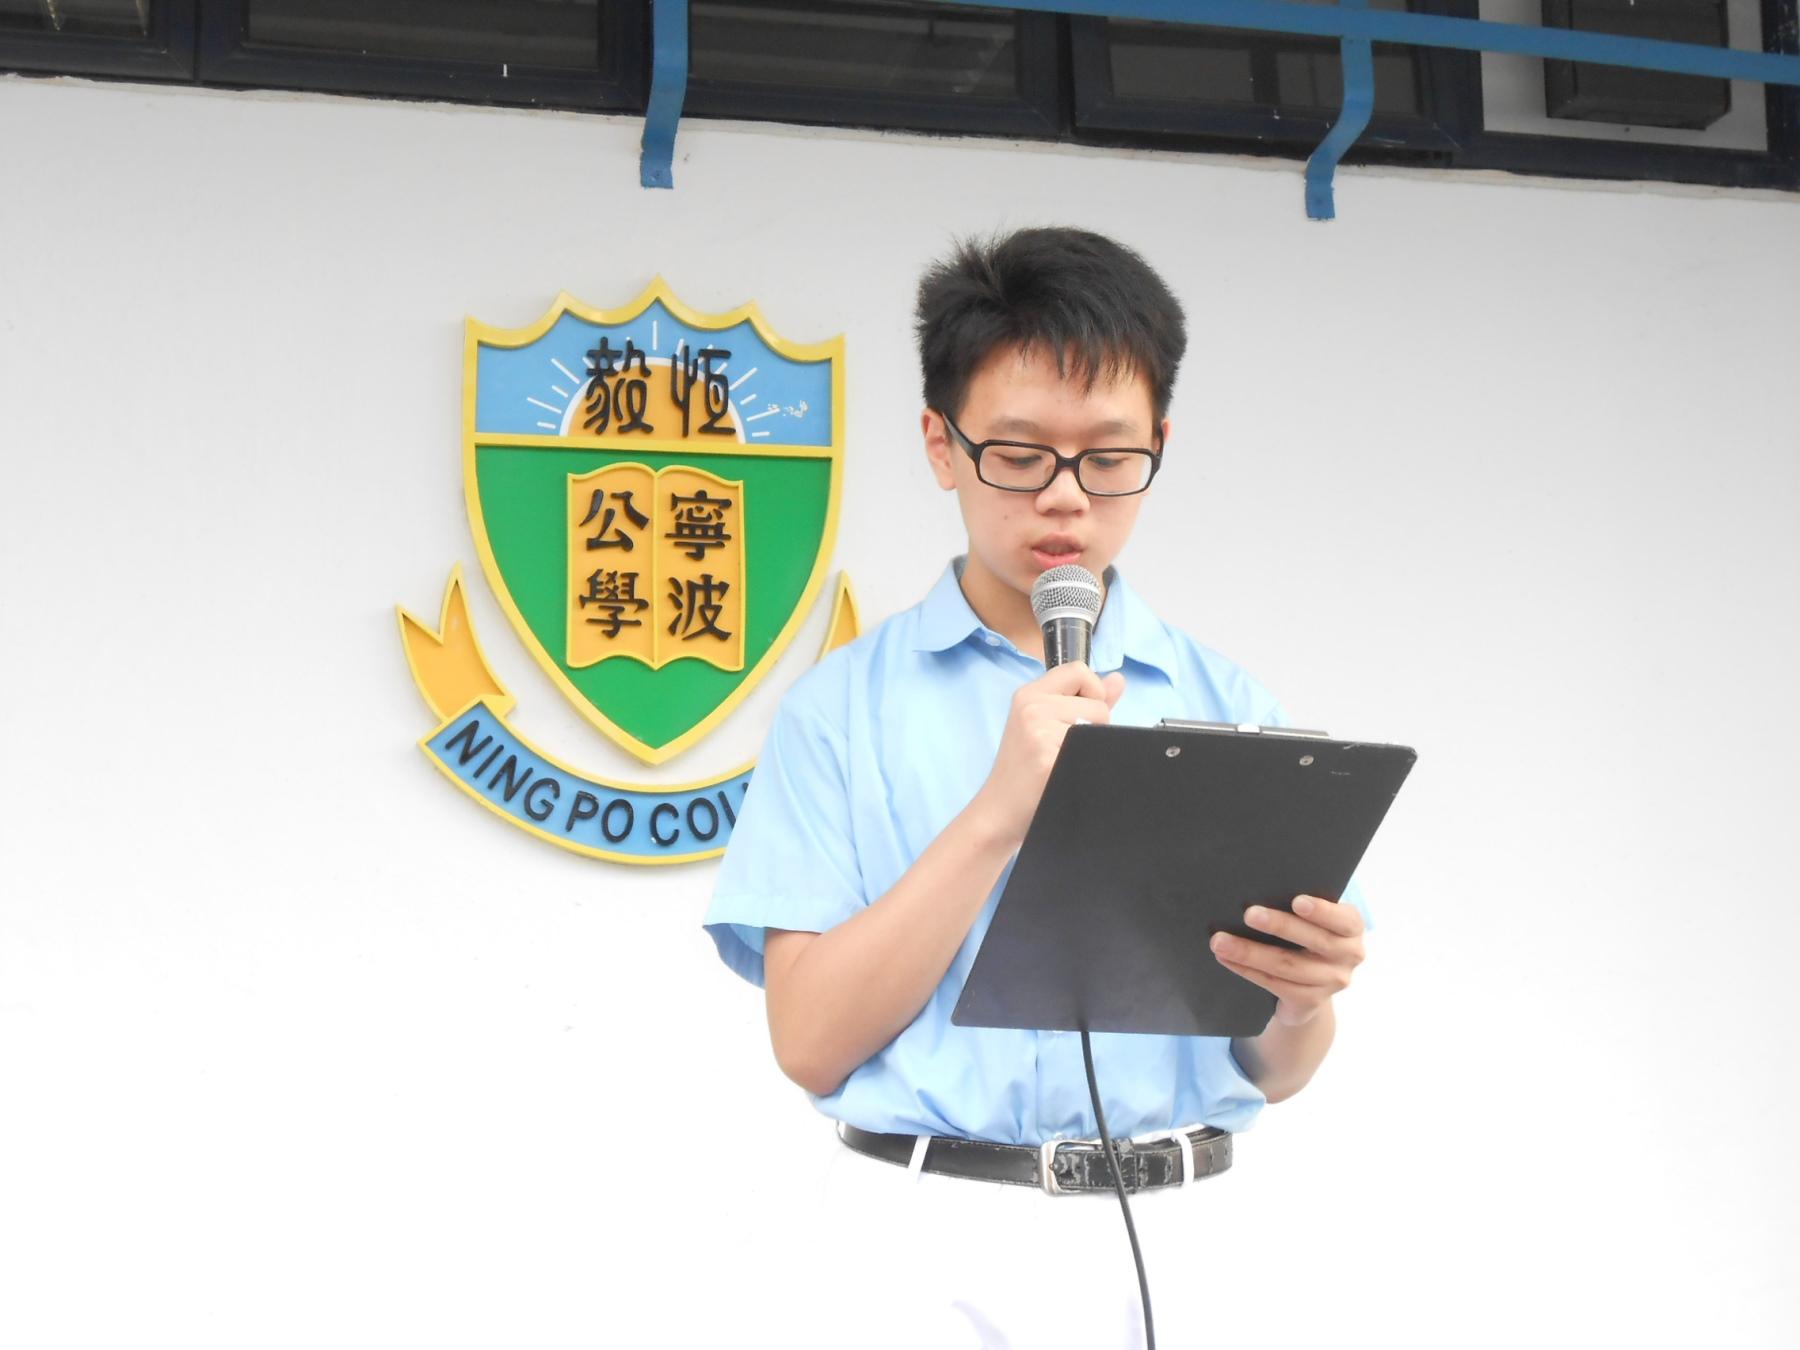 http://www.npc.edu.hk/sites/default/files/dscn9563.jpg